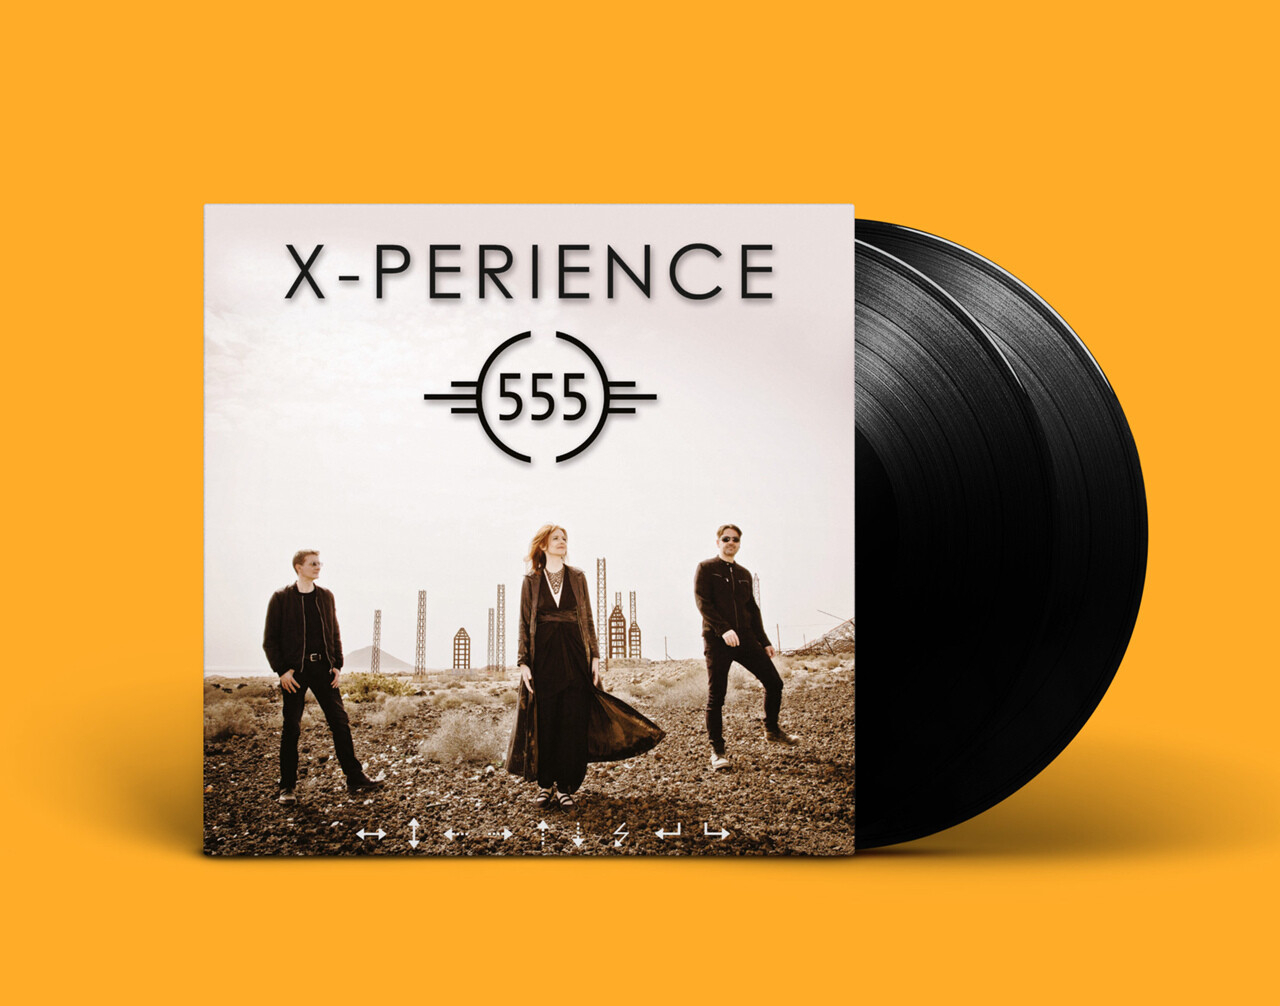 [PREORDER] LP: X-Perience — «555» (2020/2021) [2LP Black Vinyl]